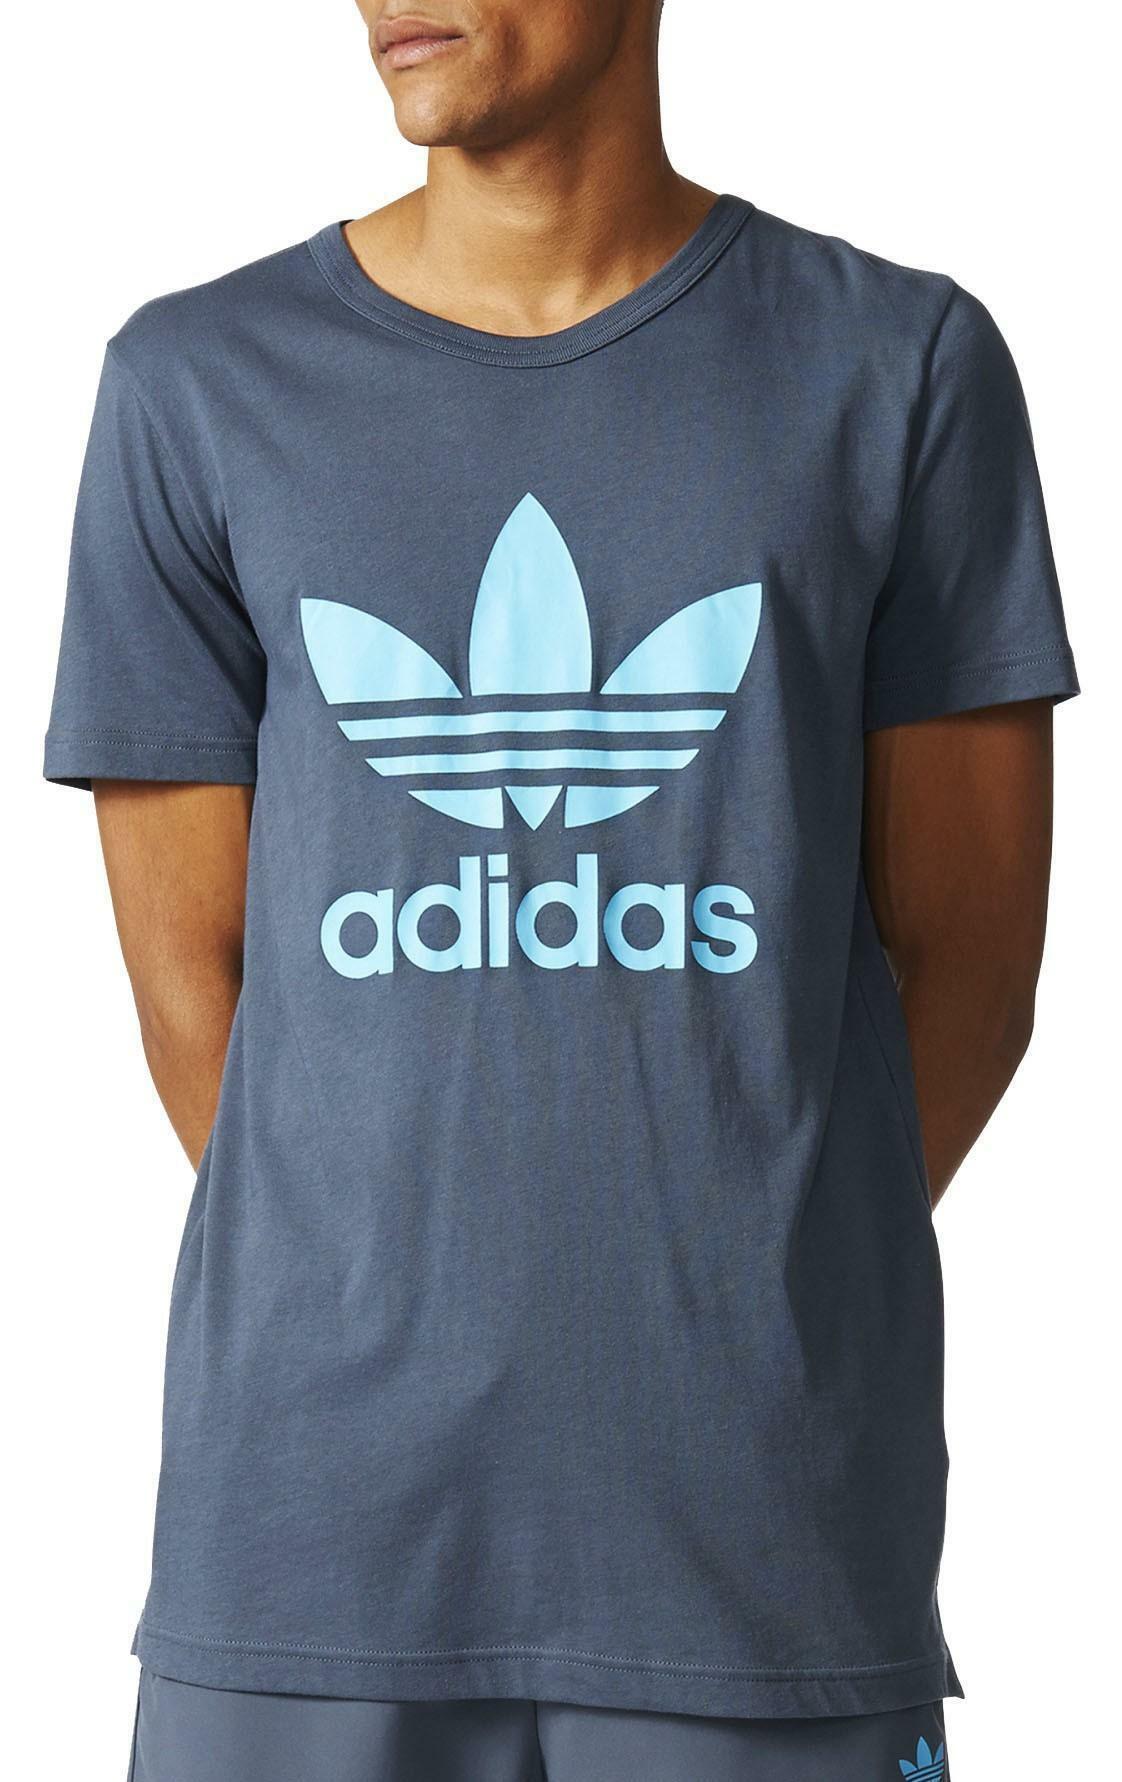 adidas adidas es trefoil tee t-shirt uomo grigia